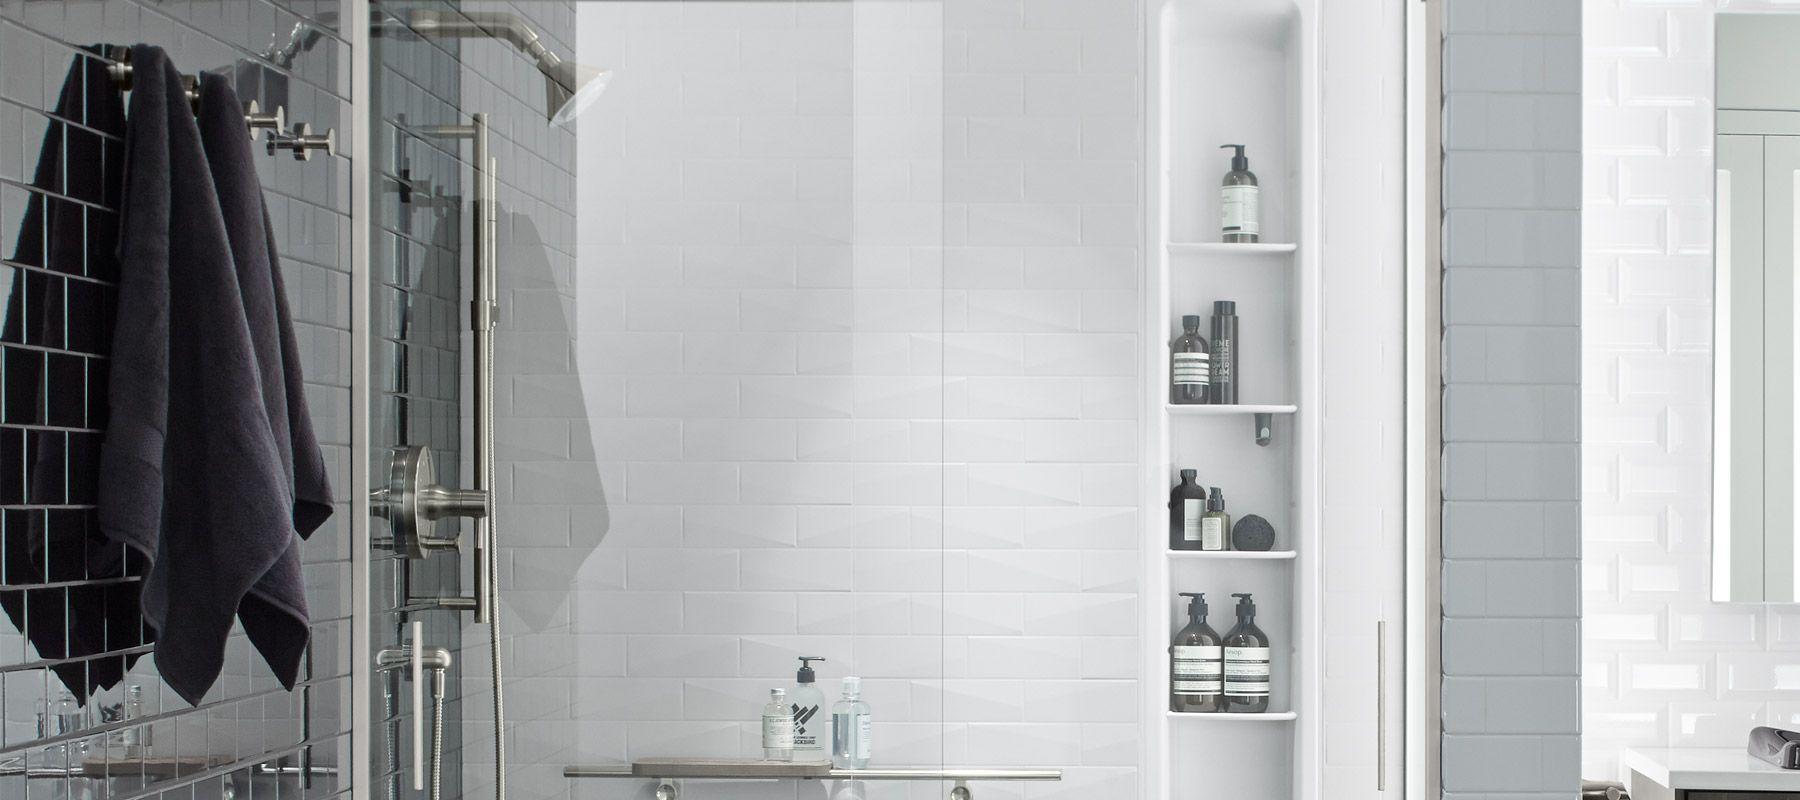 Showerheads Handshowers Bodysprays Showering Bathroom